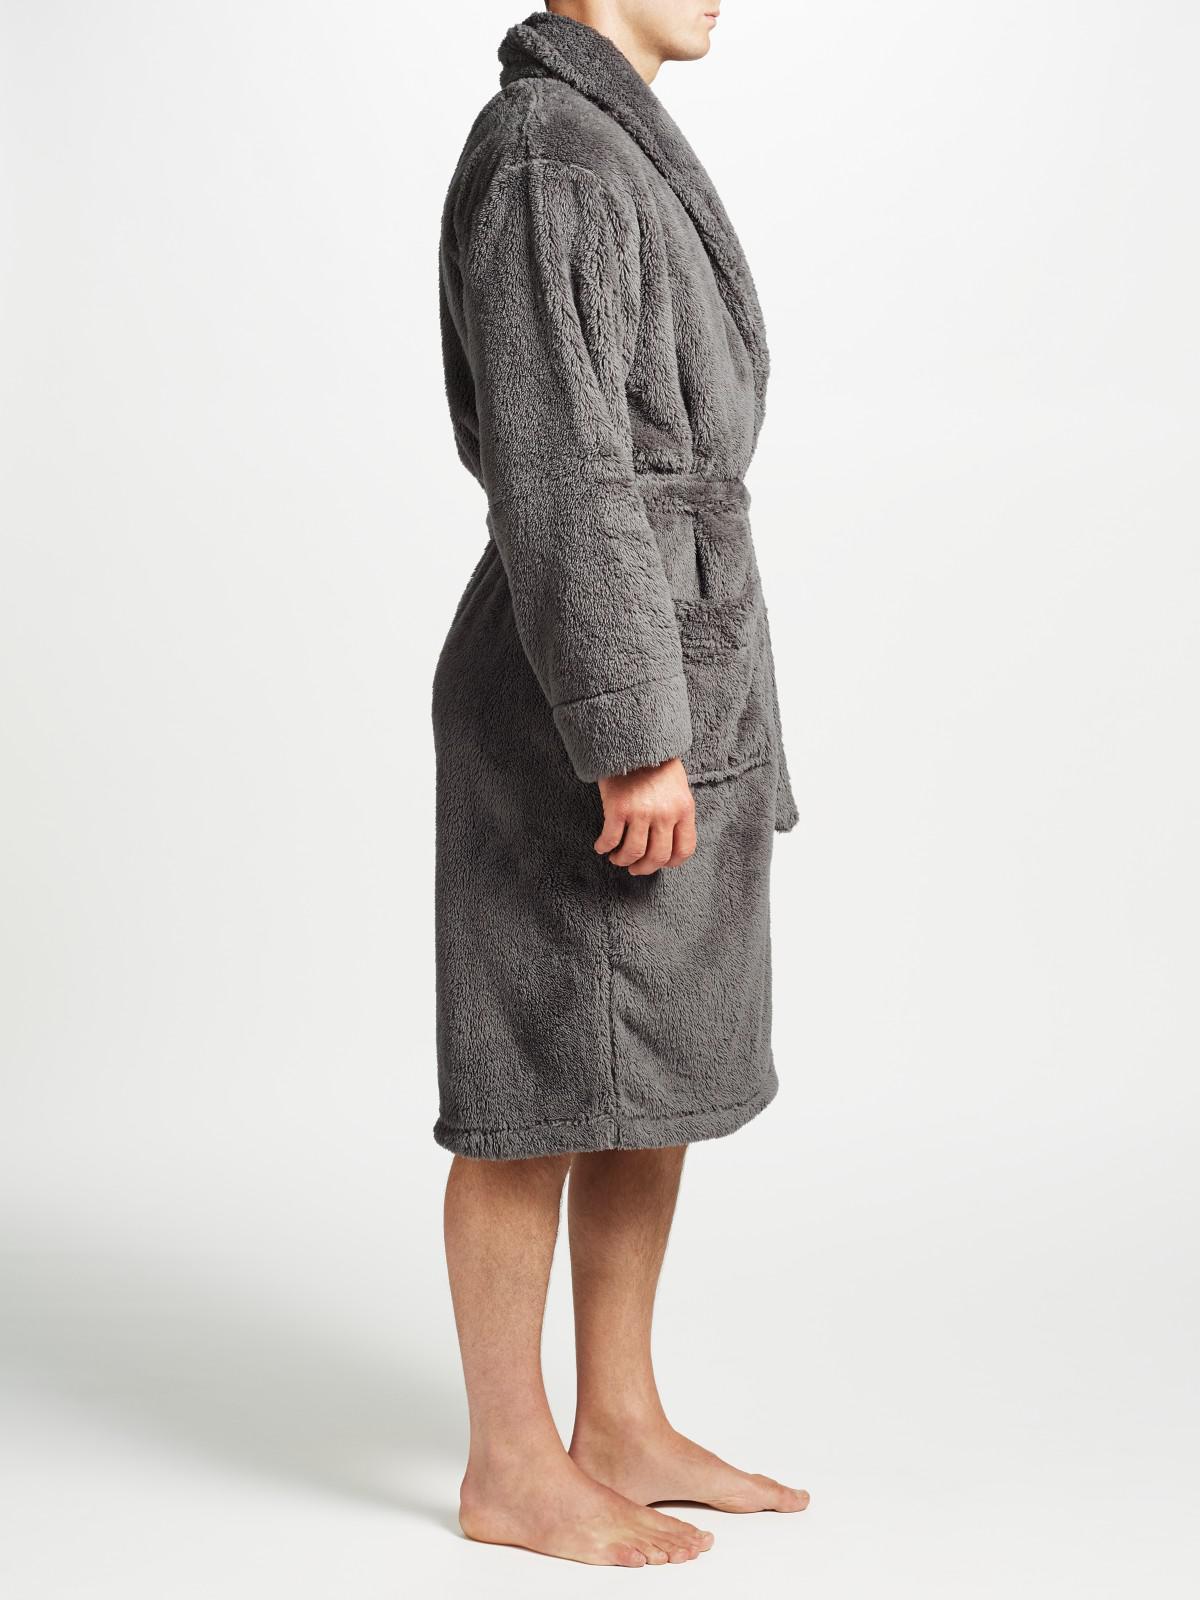 8baa6a6875 John lewis hooded high pile robe in gray for men lyst jpg 1200x1600 Vintage  pile robe